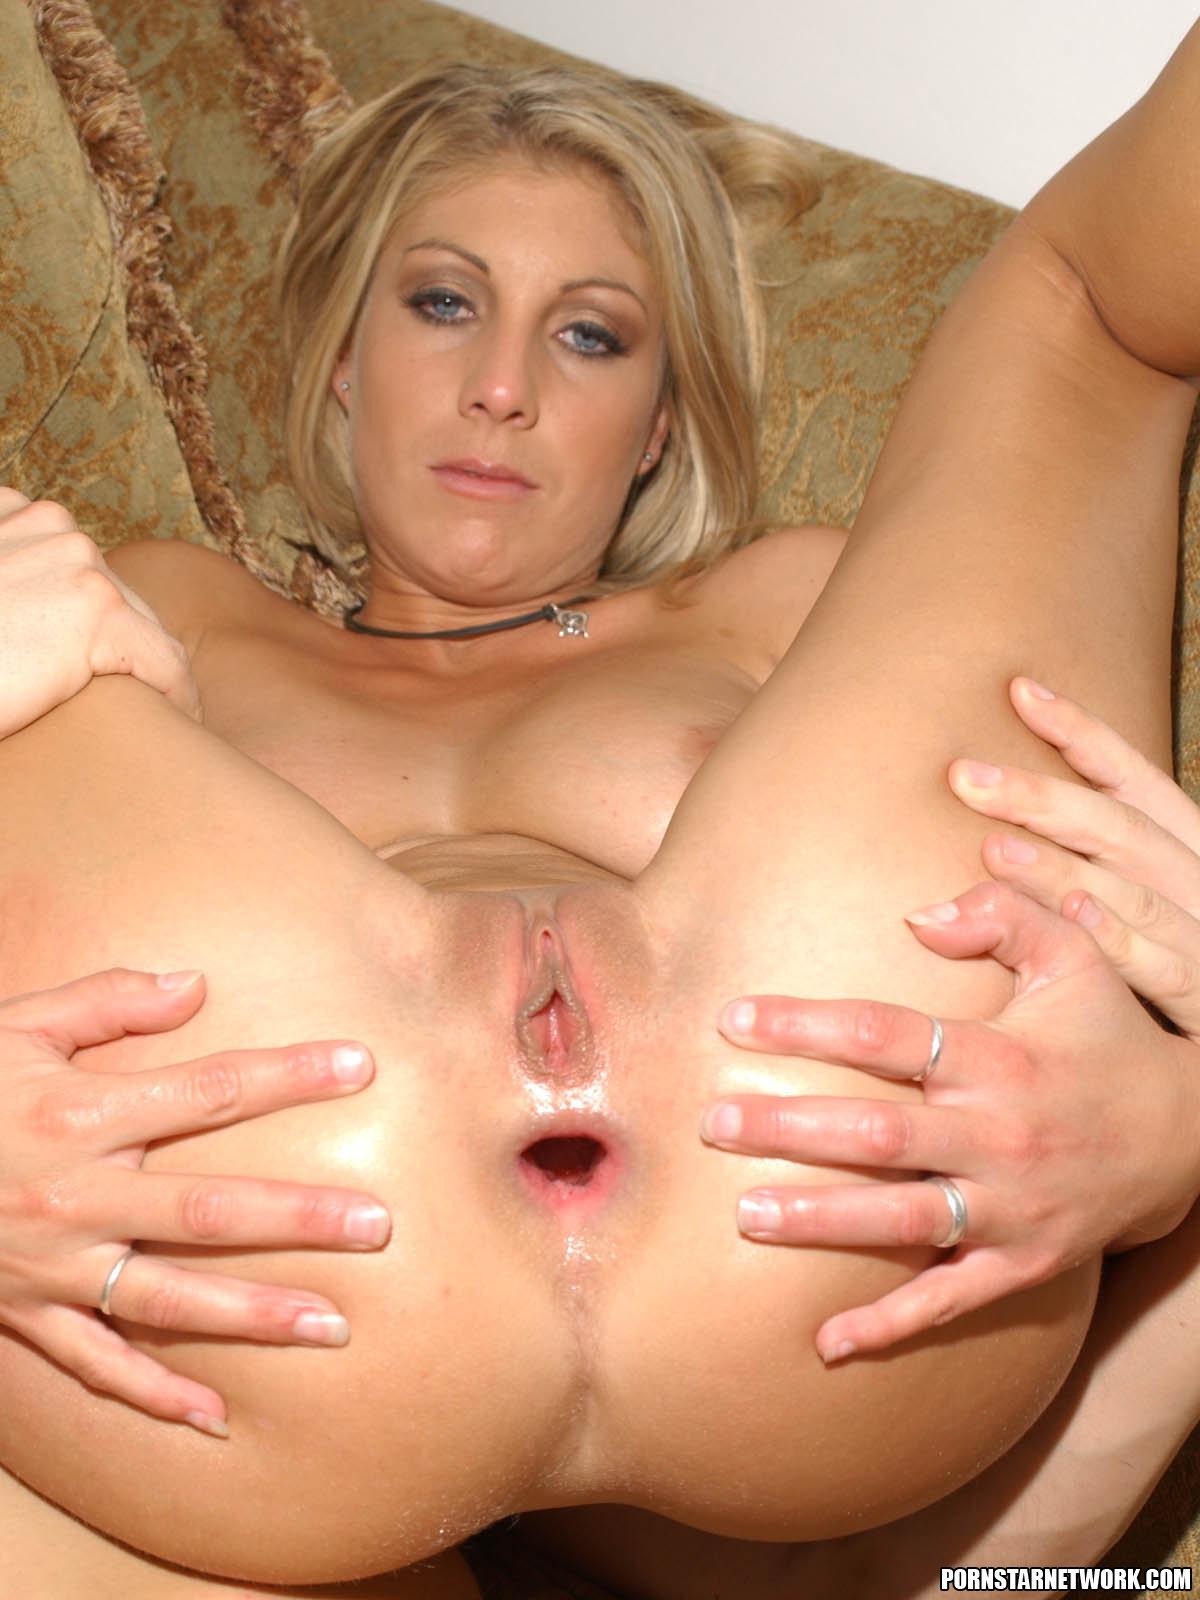 Tiffany six anal